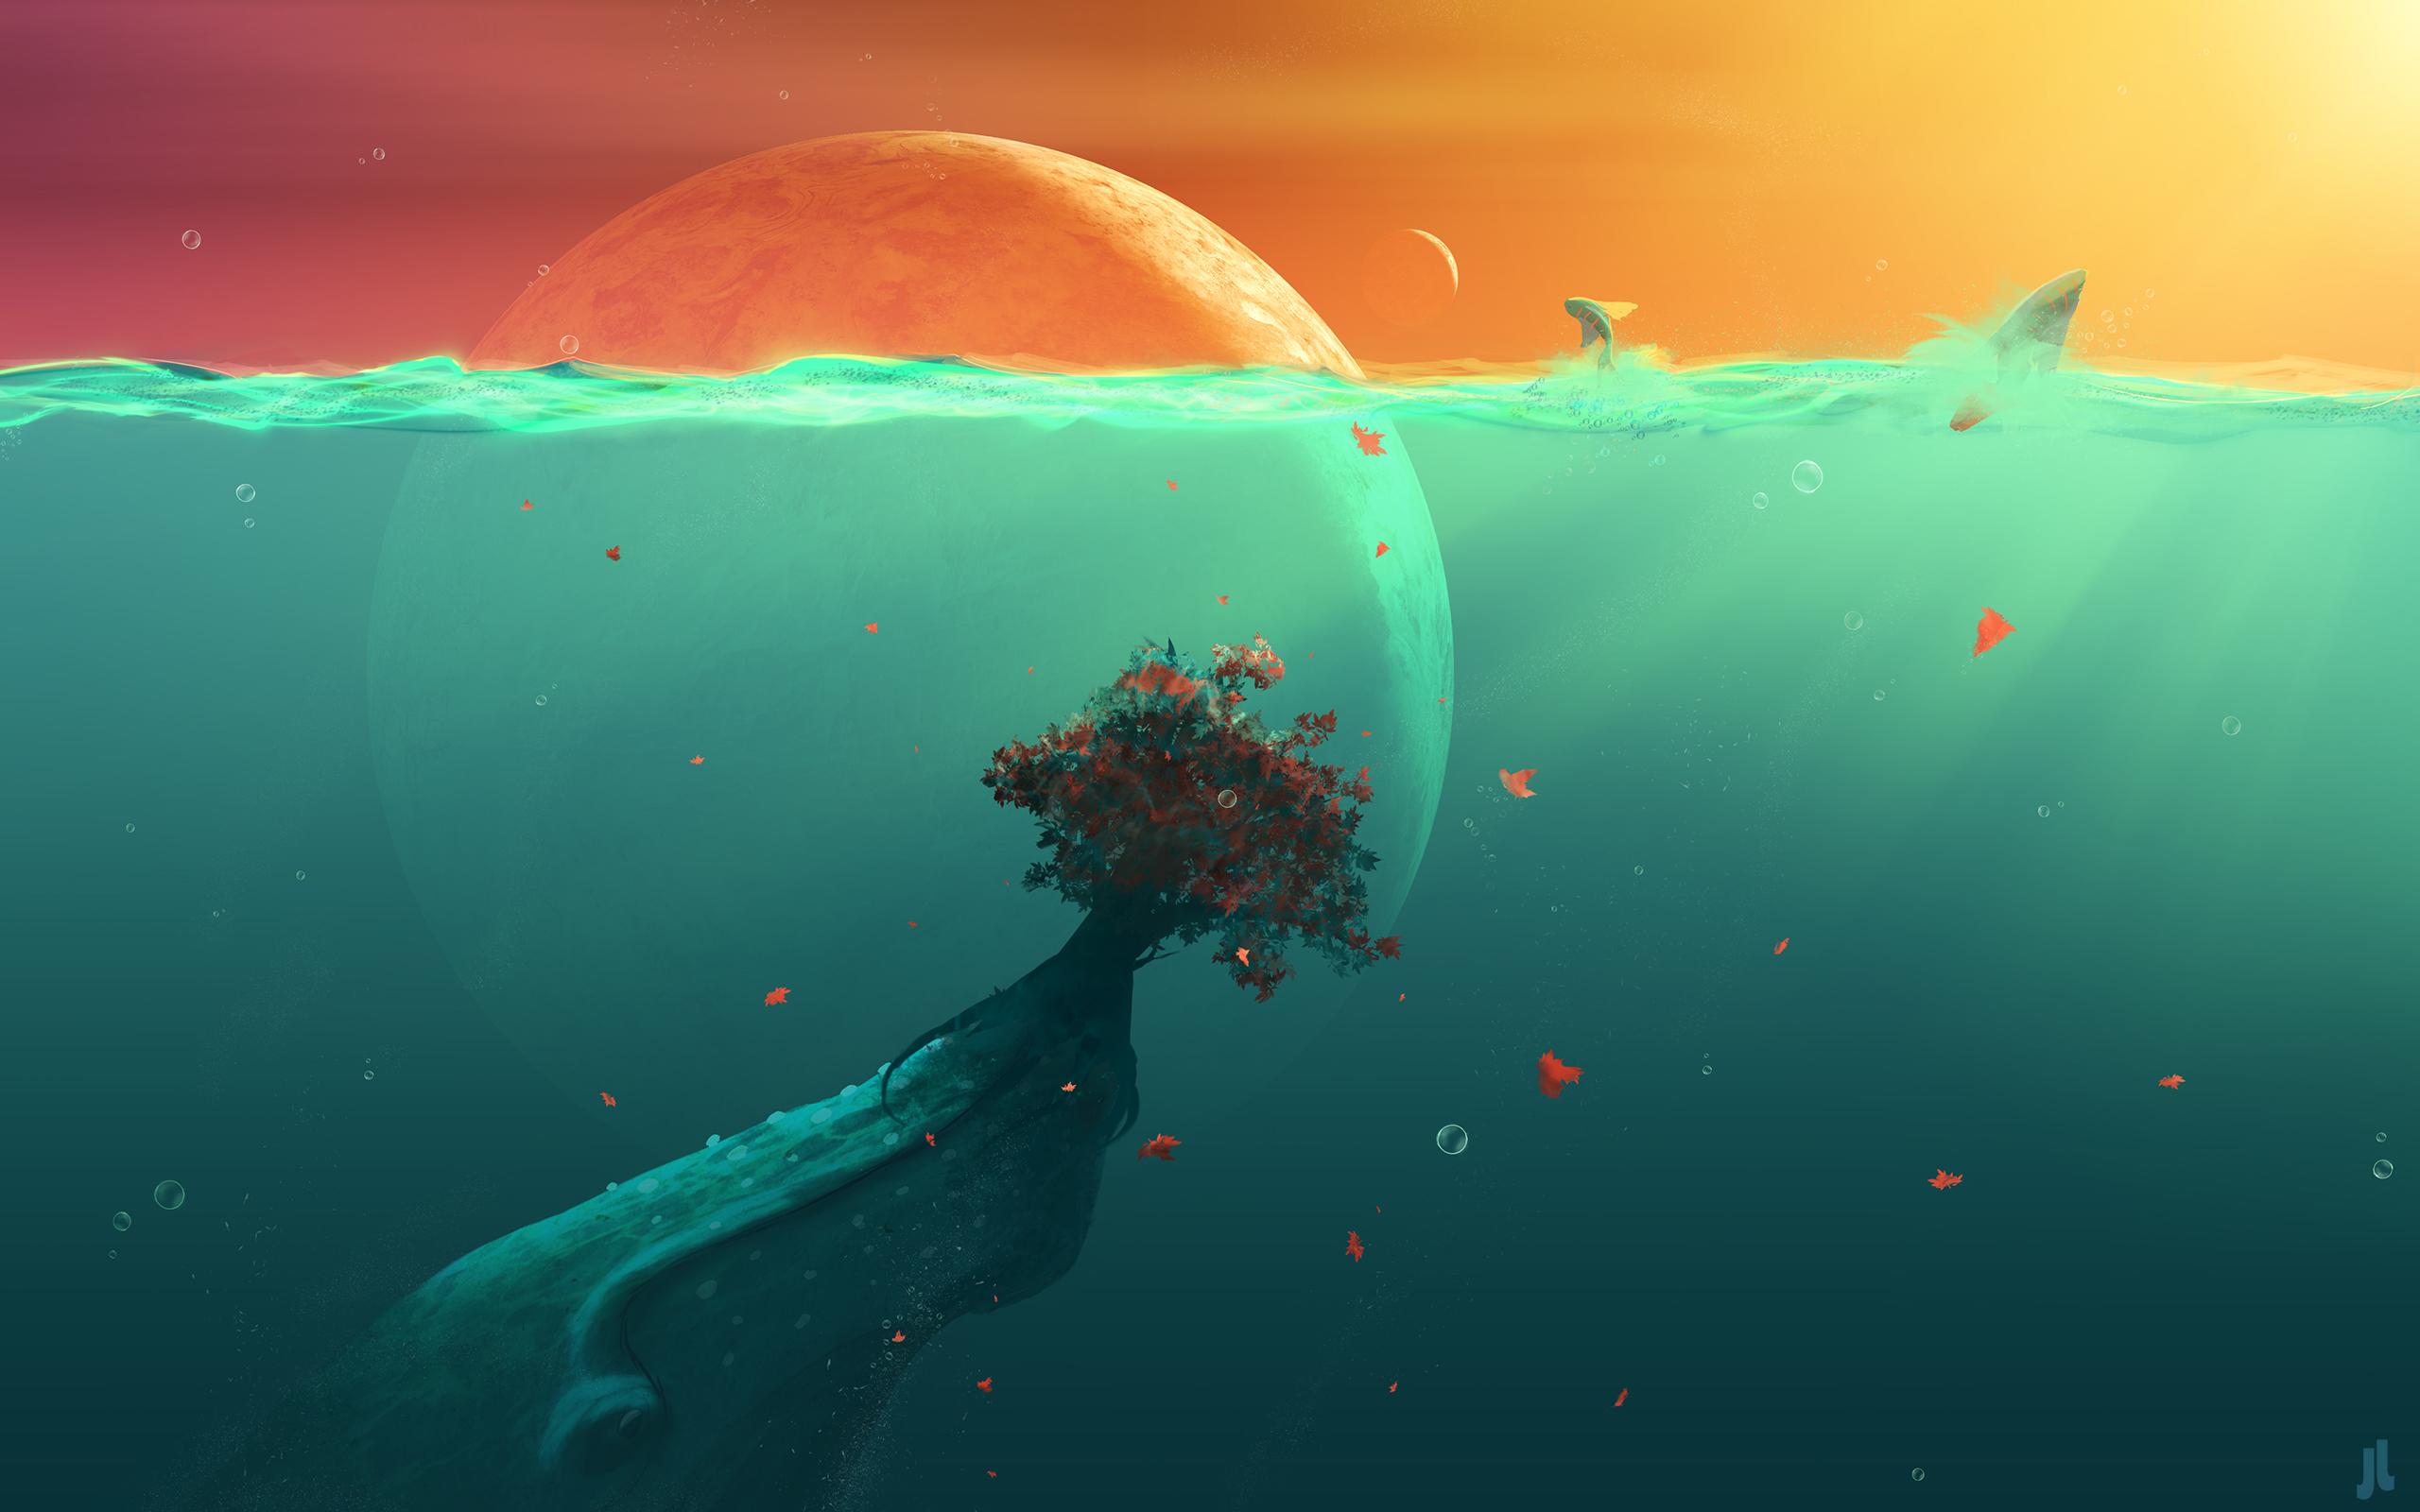 Cute Fish Iphone Wallpaper Deep Ocean Planet Fish Wallpapers Hd